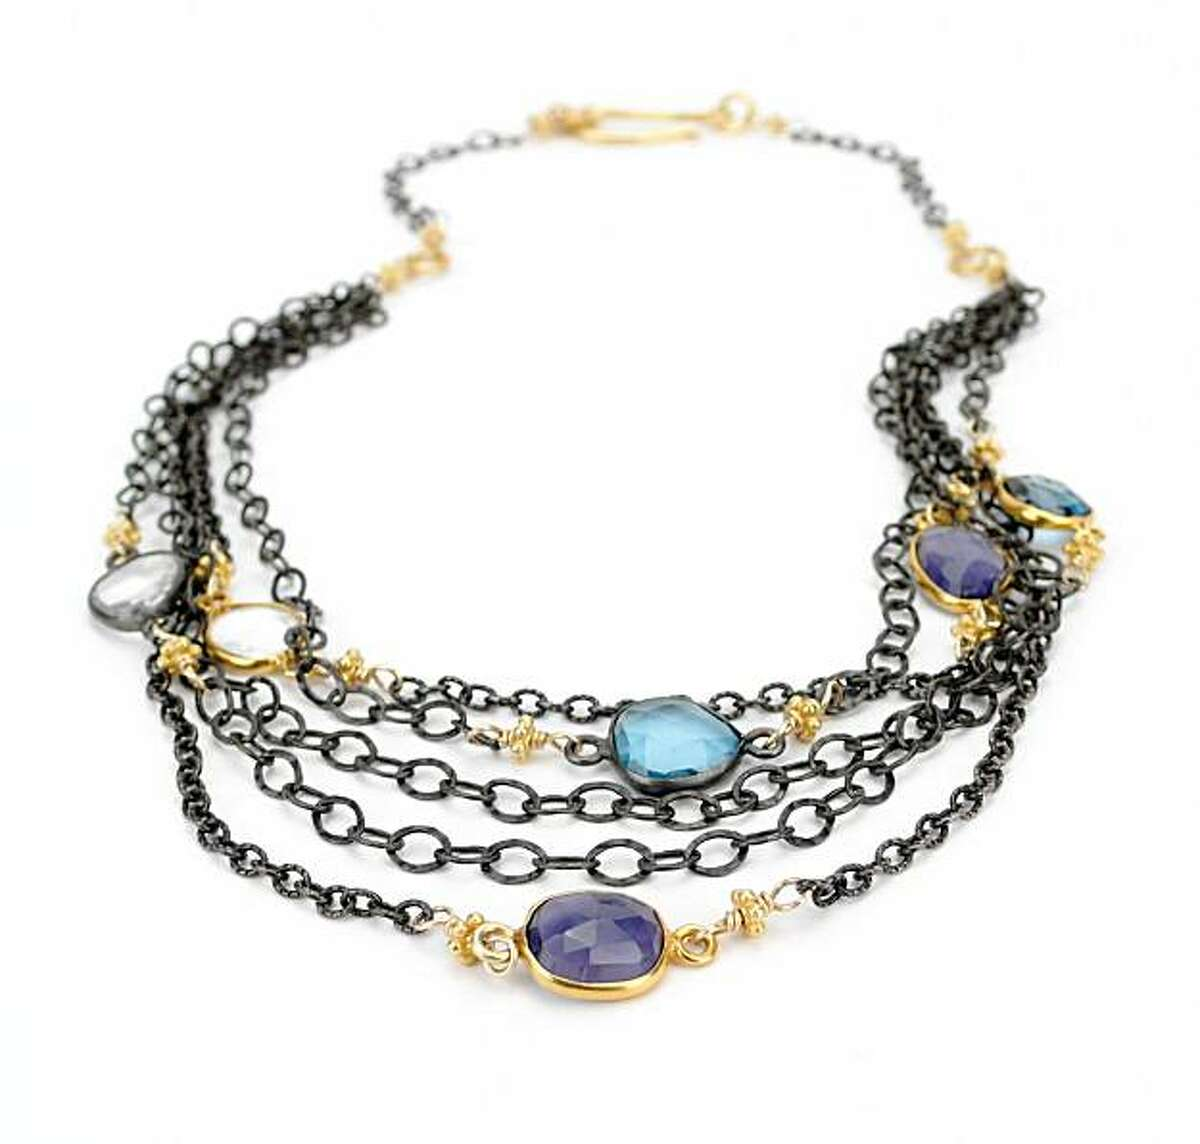 Petaluma jewelry designer Robindira Unsworth's gemstone bib necklace ($450) combines London blue topaz, quartz, iolite, 22K gold vermeil and oxidized sterling silver. It's sold at Margaret O'Leary in San Francisco.